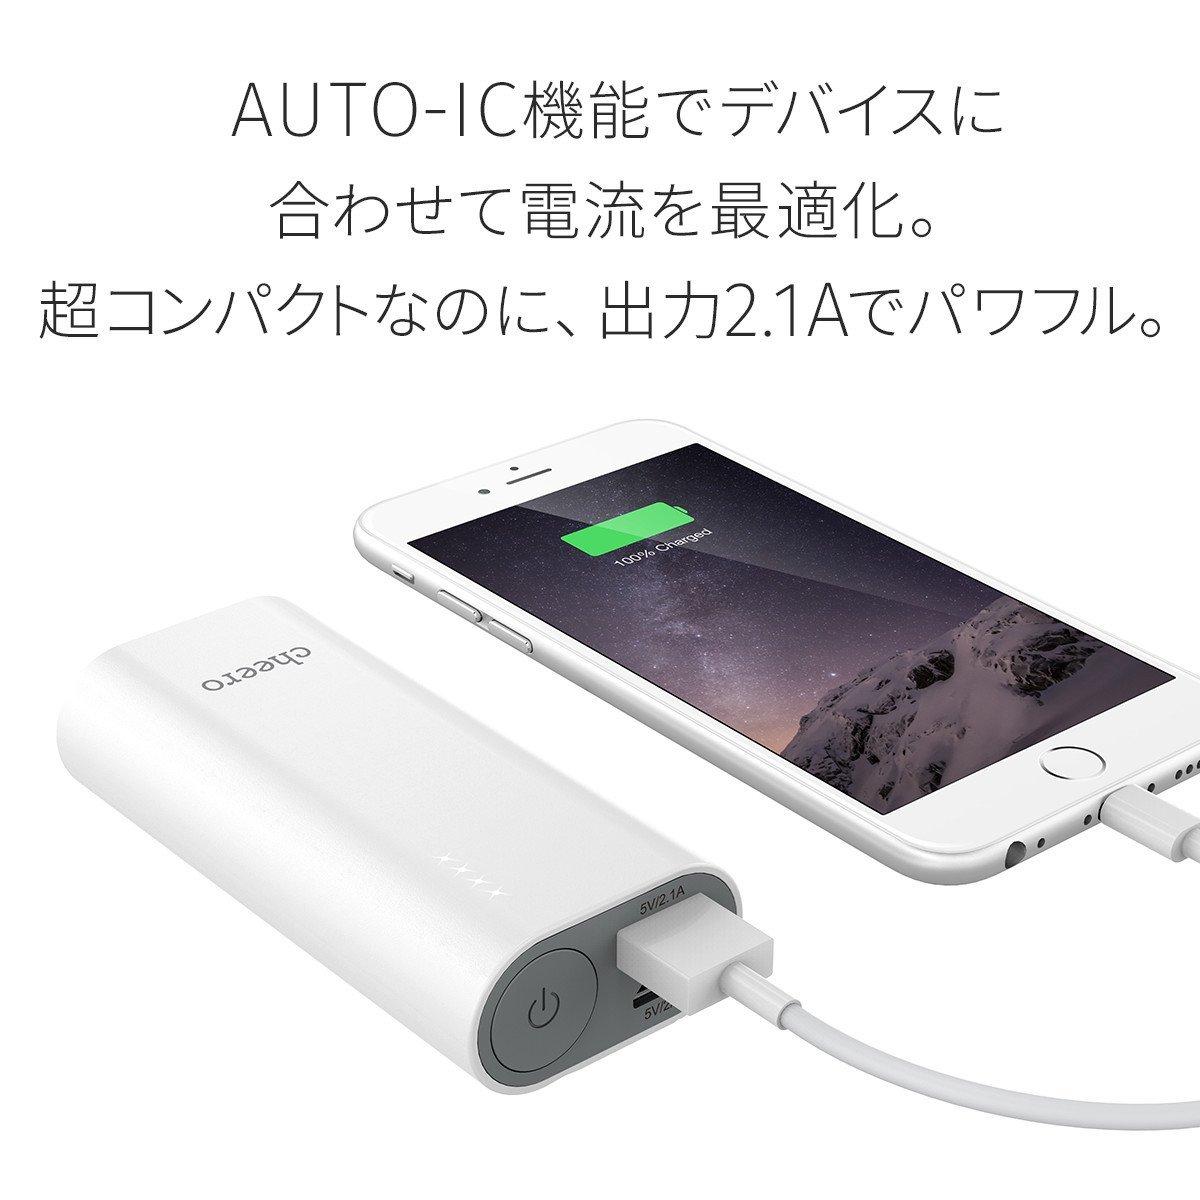 cheero Power Plus 3 mini 6700mAh が特価1,580円で発売中